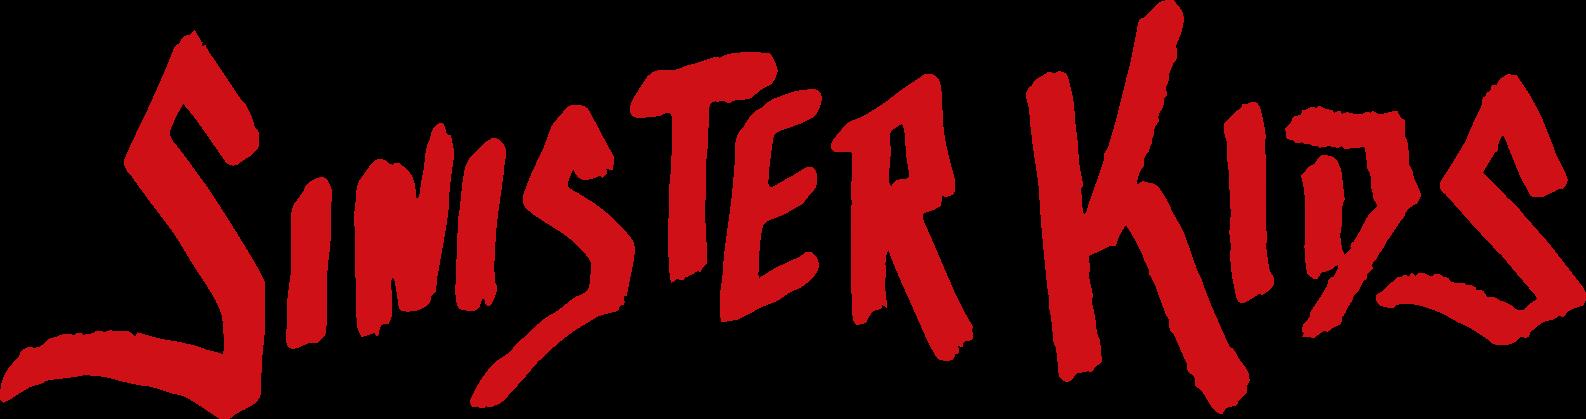 SINISTER KIDS